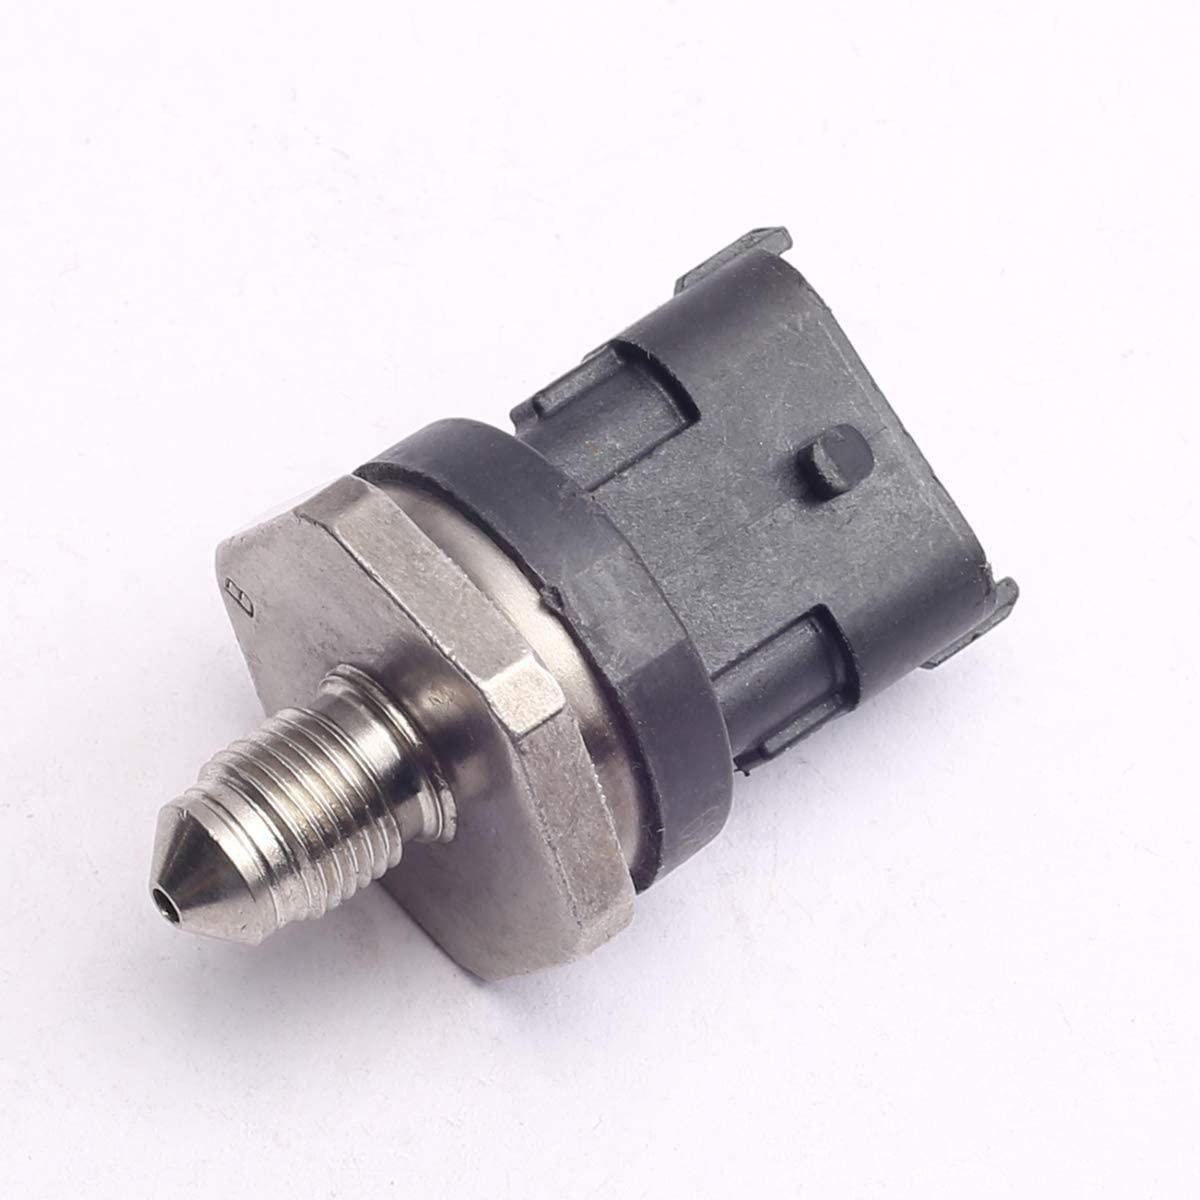 CENTAURUS Fuel Rail Pressure Sensor Replacement for L807-18-211/12598948 (Part# 0261545074)